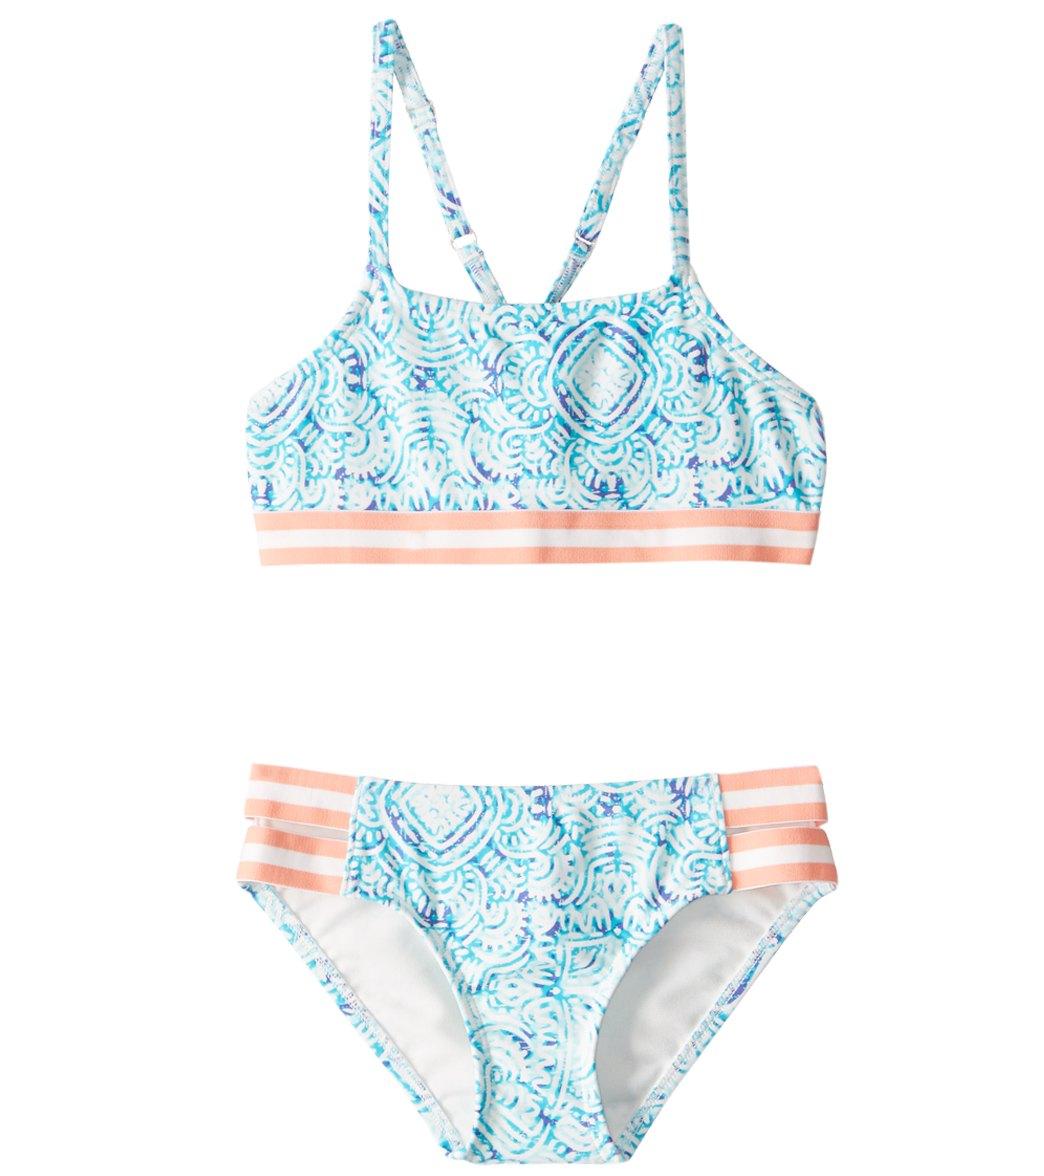 8f21c2794dd1b Roxy Girl's Caribbean Days Halter Bikini Set (7-16) at SwimOutlet.com